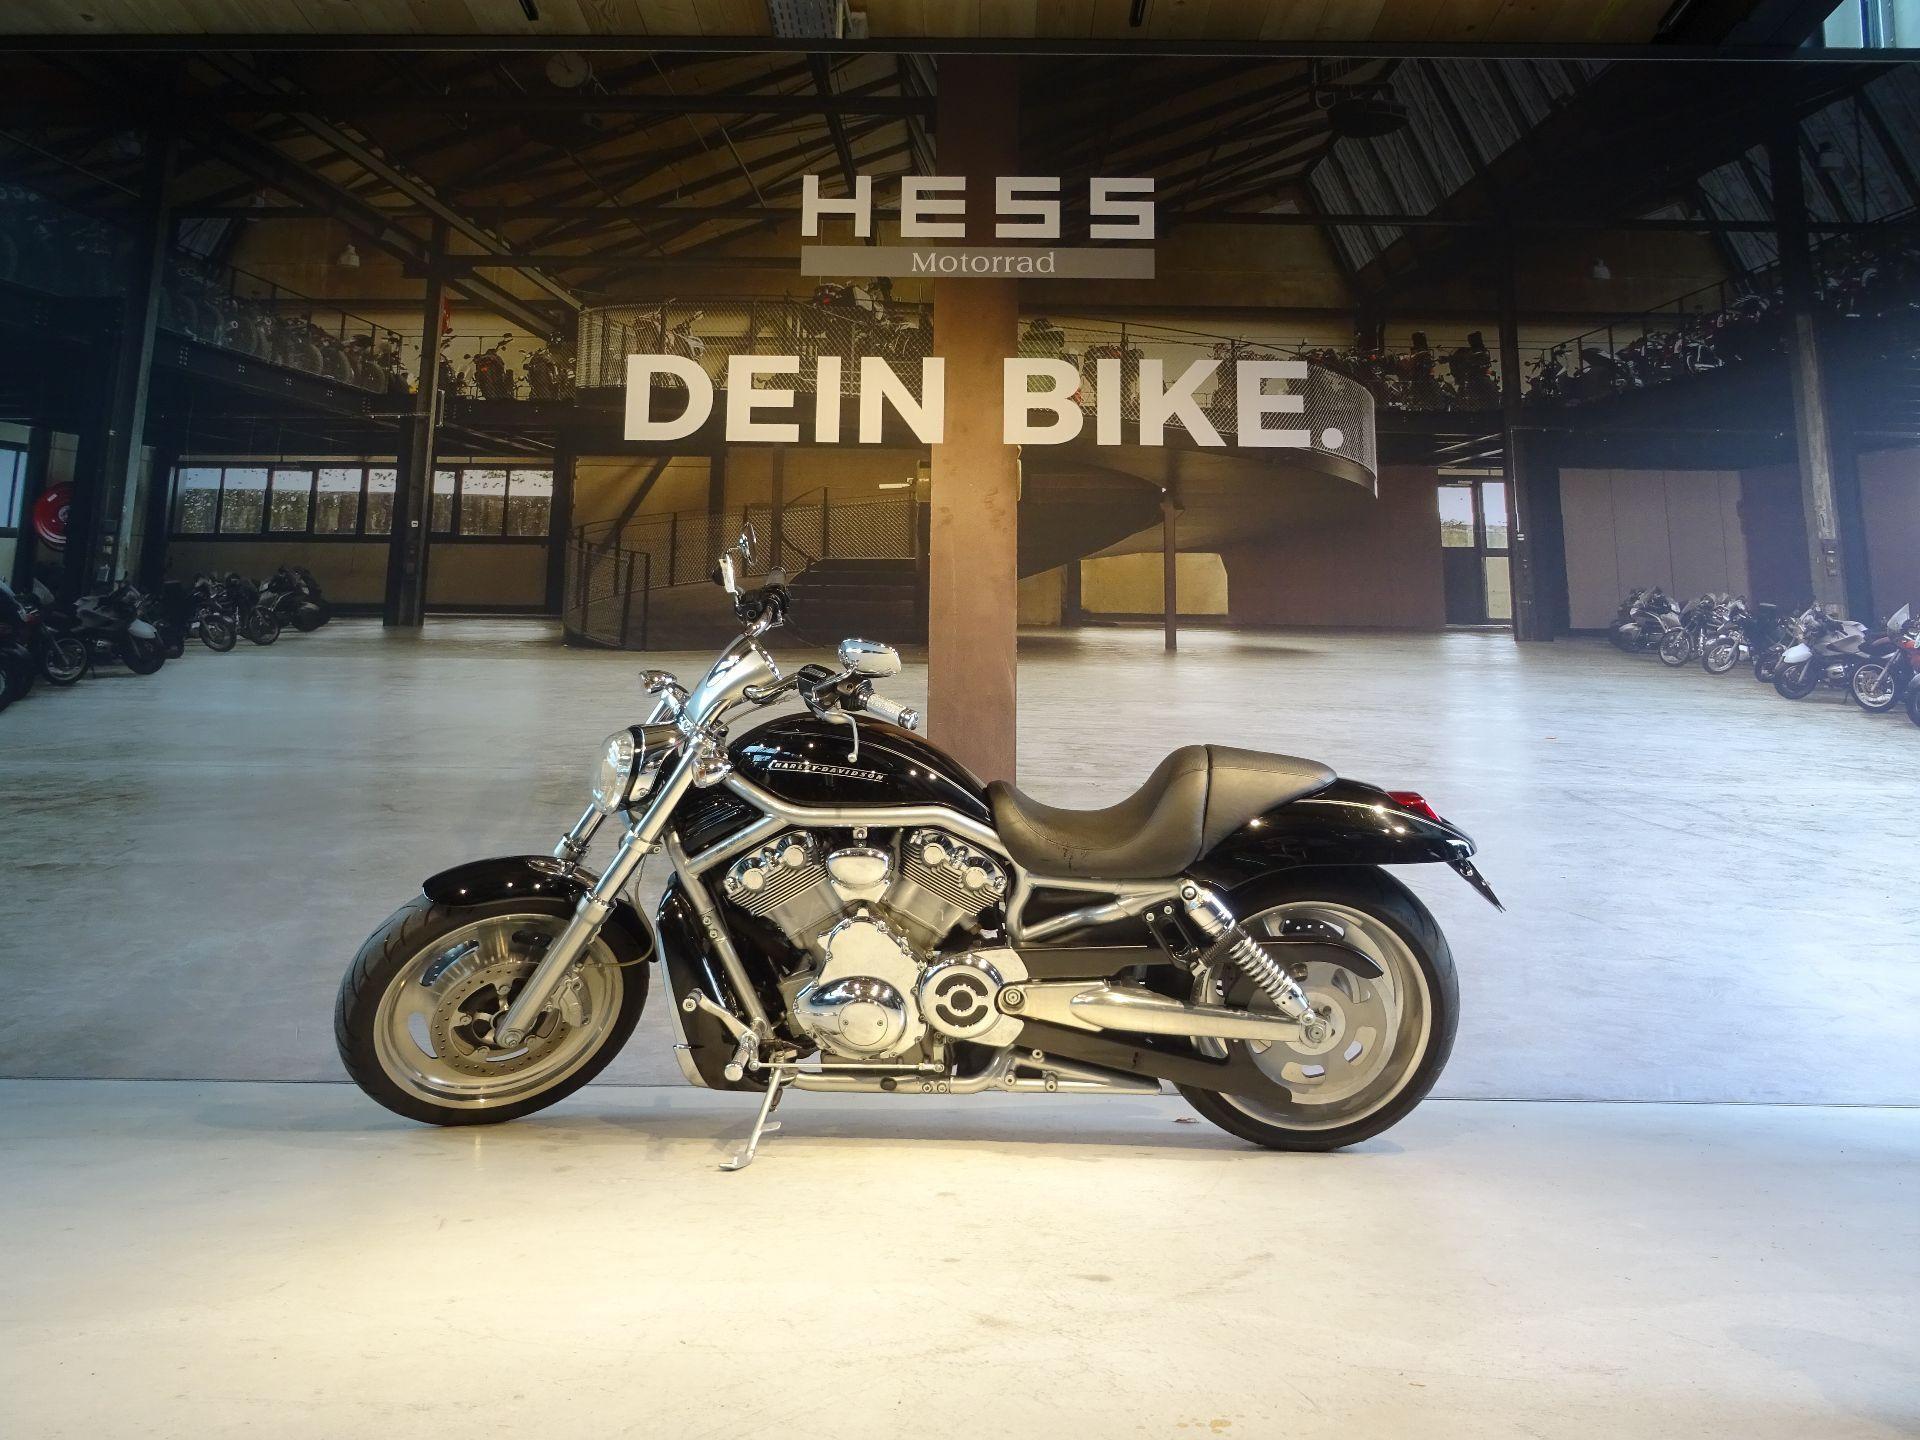 motorrad occasion kaufen harley davidson vrscaw 1130 v rod hess motorrad stettlen. Black Bedroom Furniture Sets. Home Design Ideas